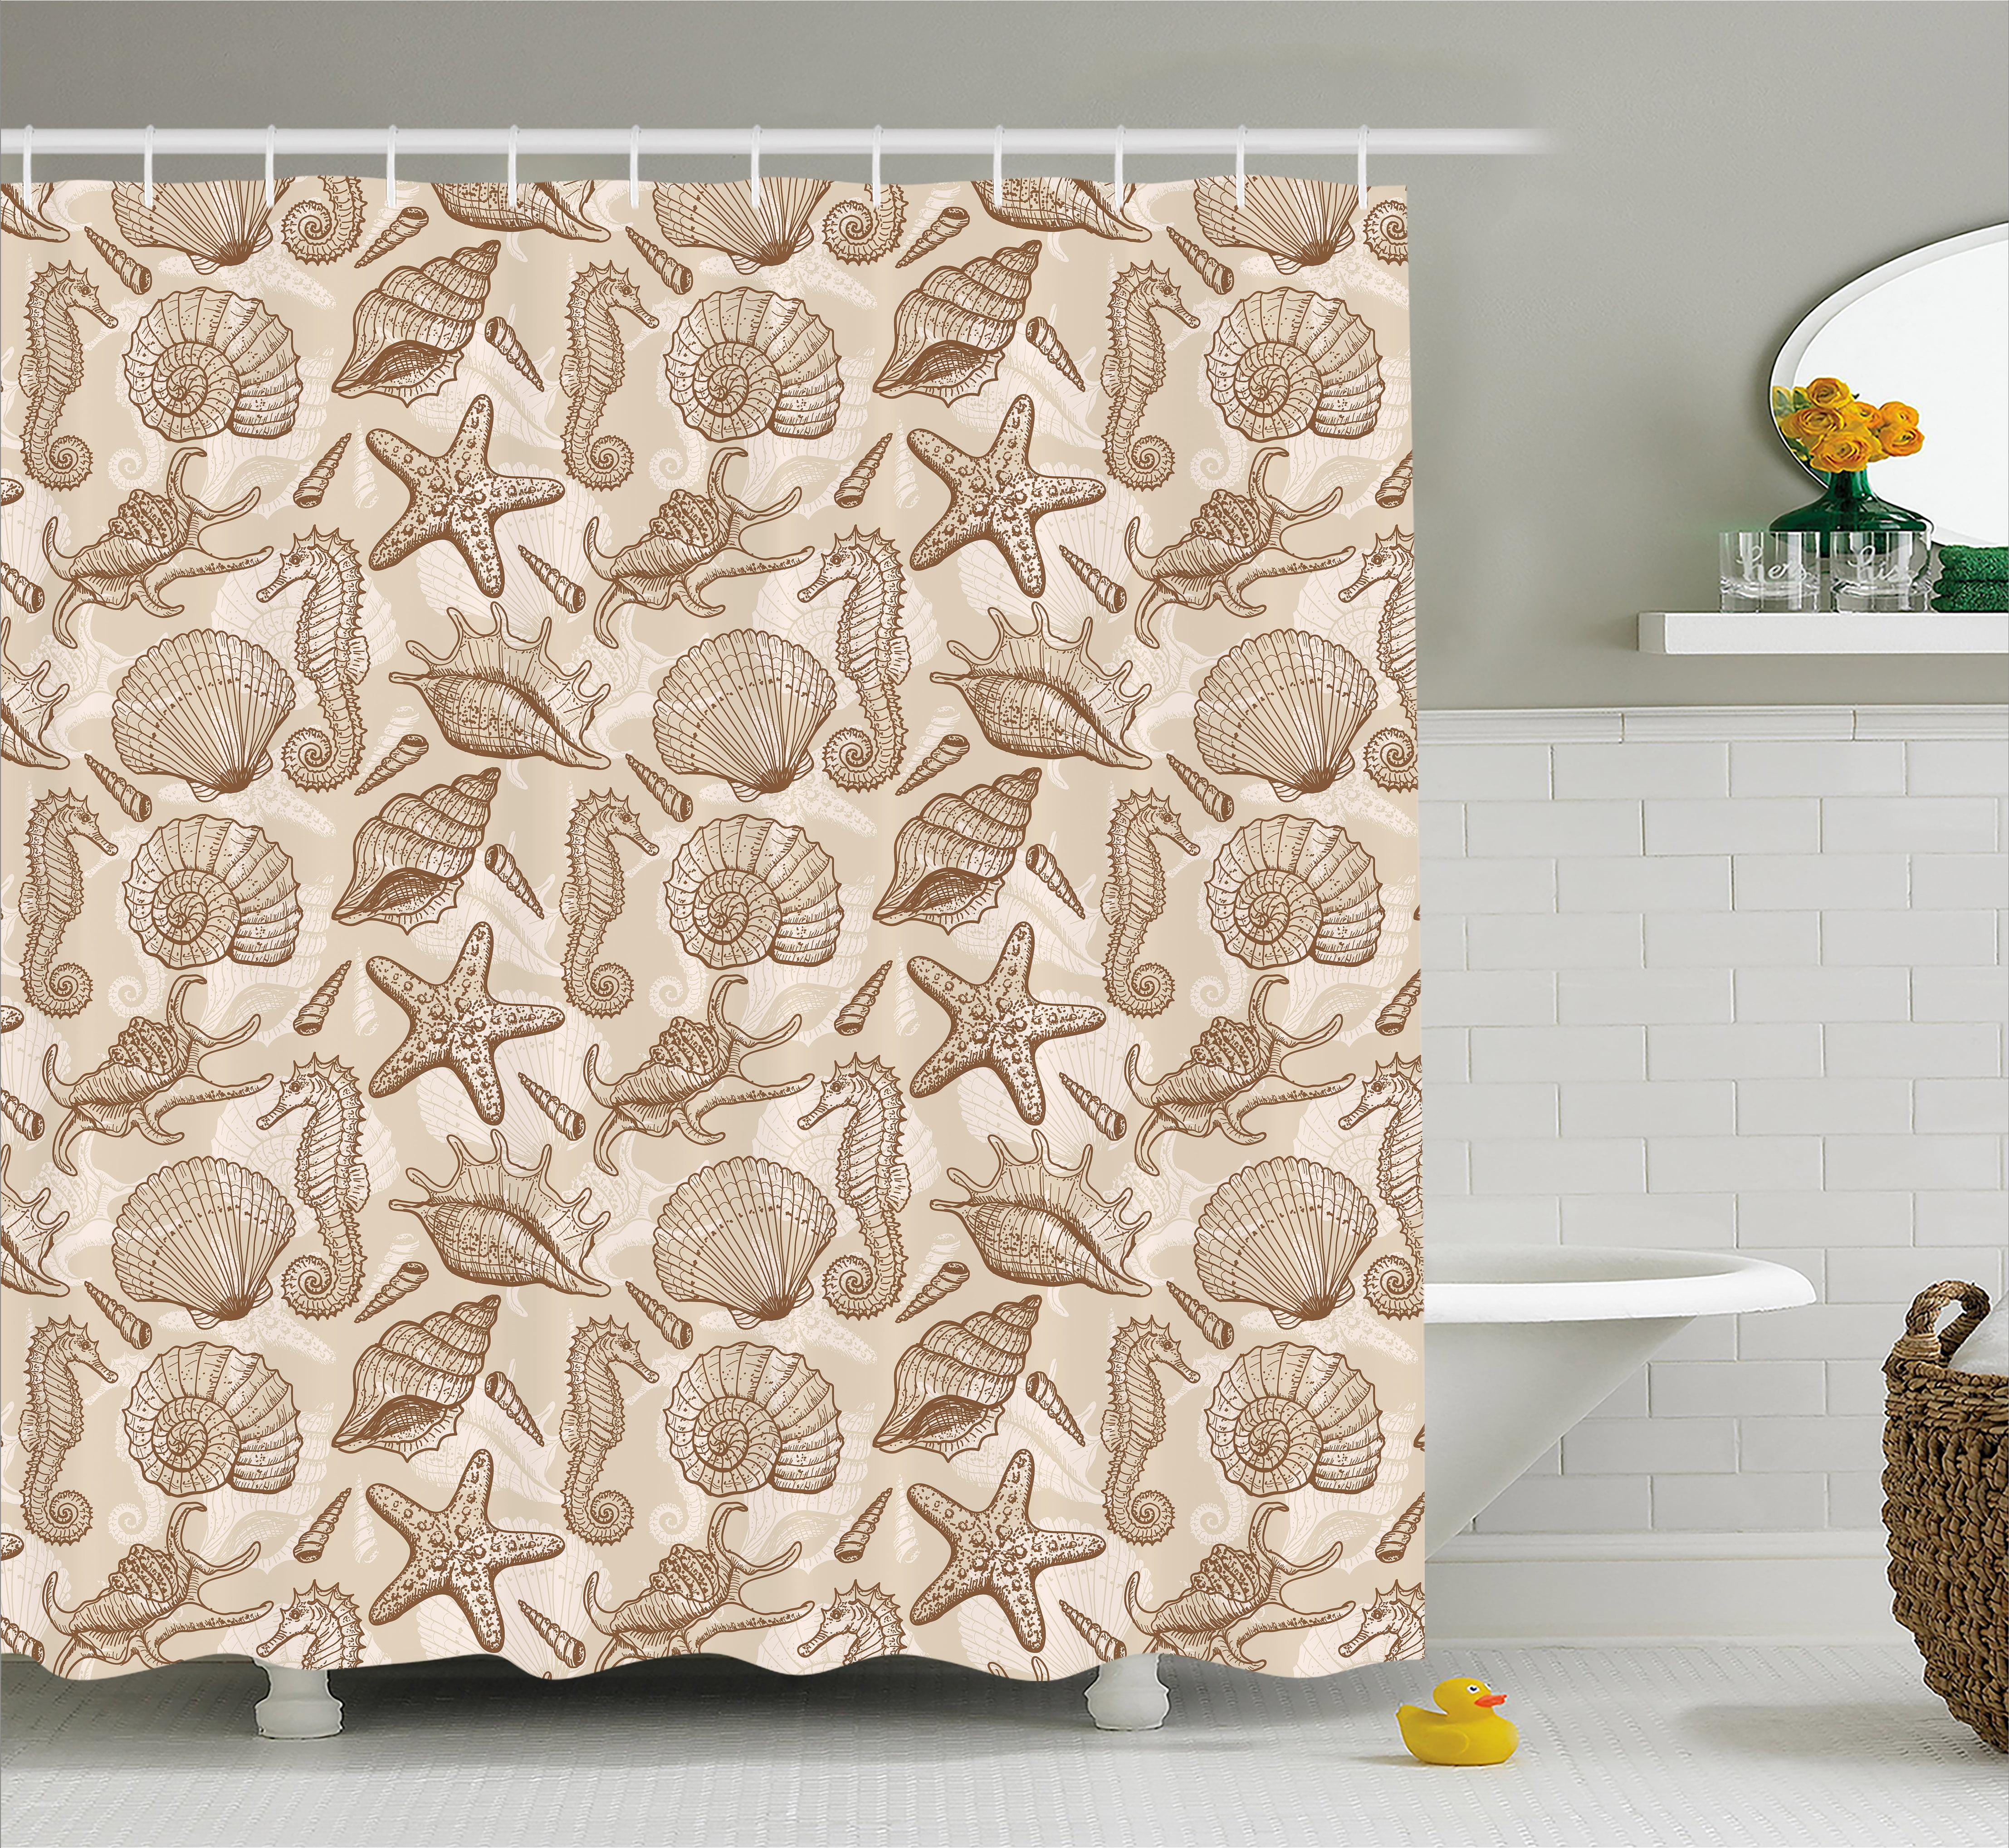 Sea Shells Shower Curtain, Vintage Inspired Monochrome ...